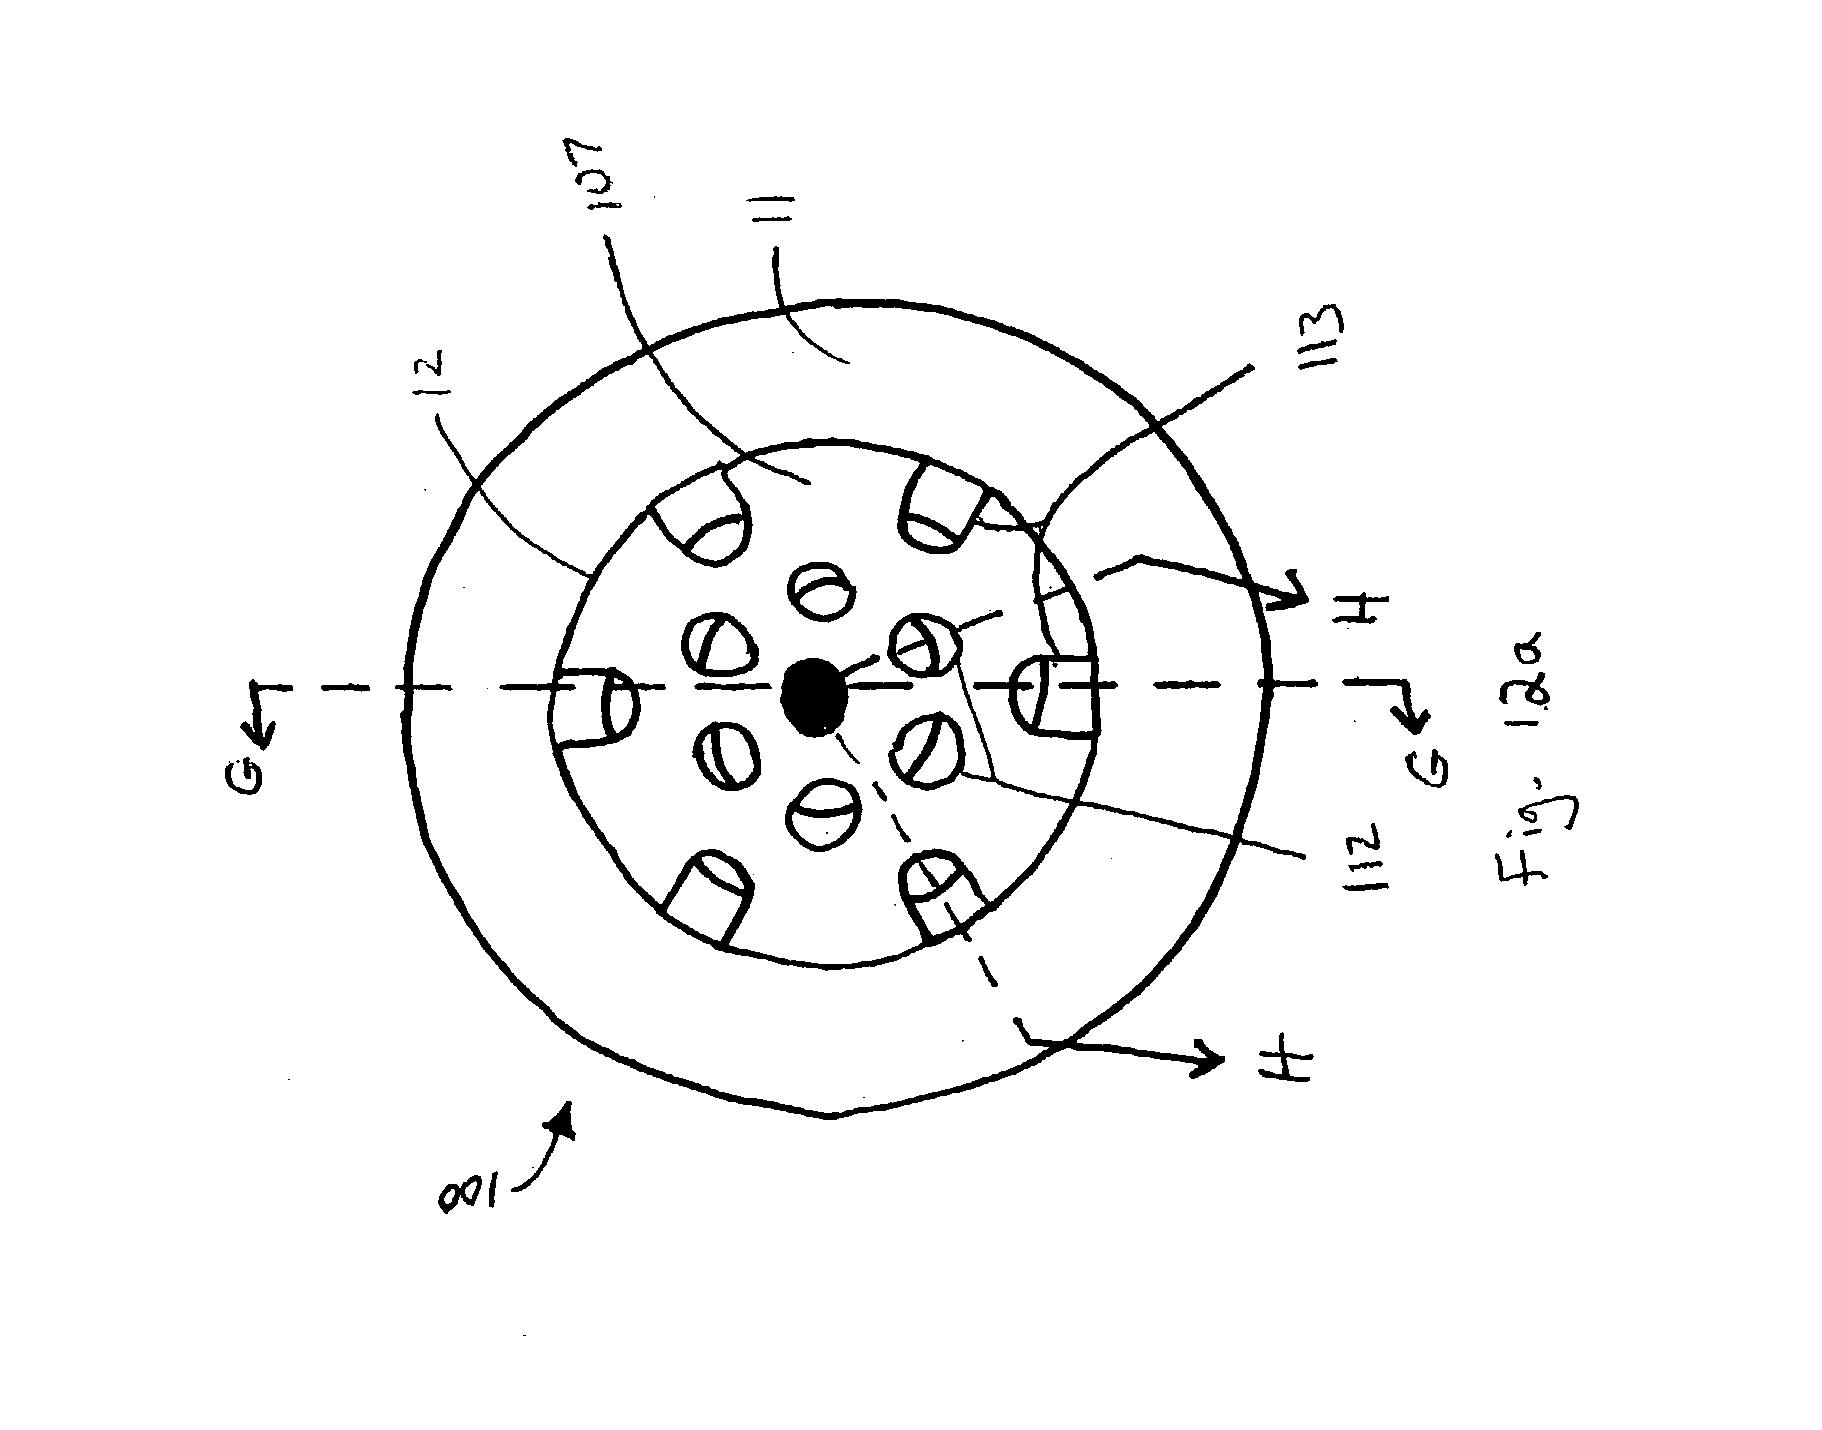 patent us20030133310 automotive lamp assembly moisture control system google patentsuche. Black Bedroom Furniture Sets. Home Design Ideas